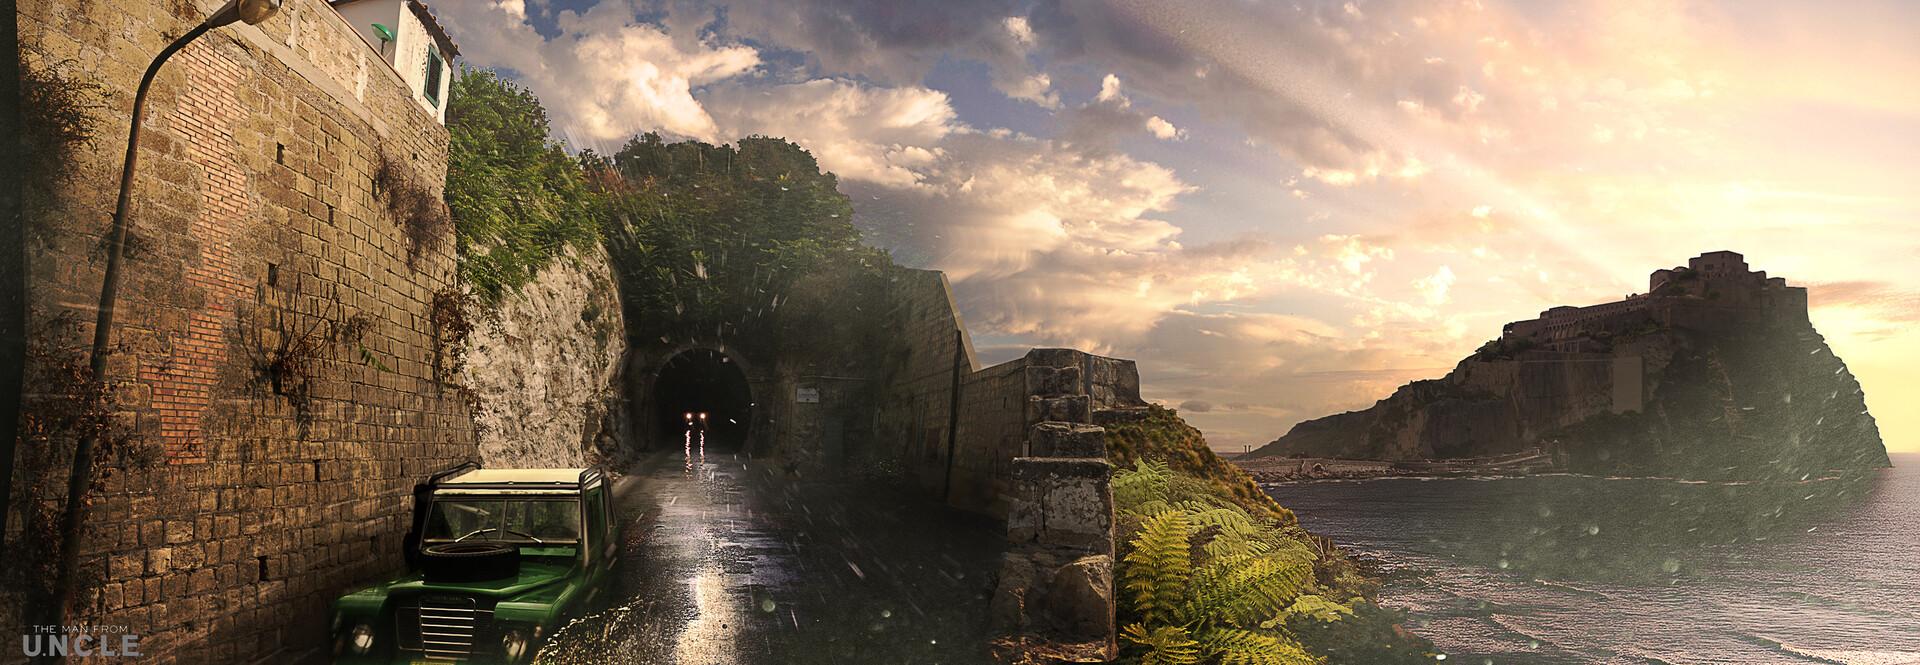 Kieran belshaw tunnel landrover panorama v002 web